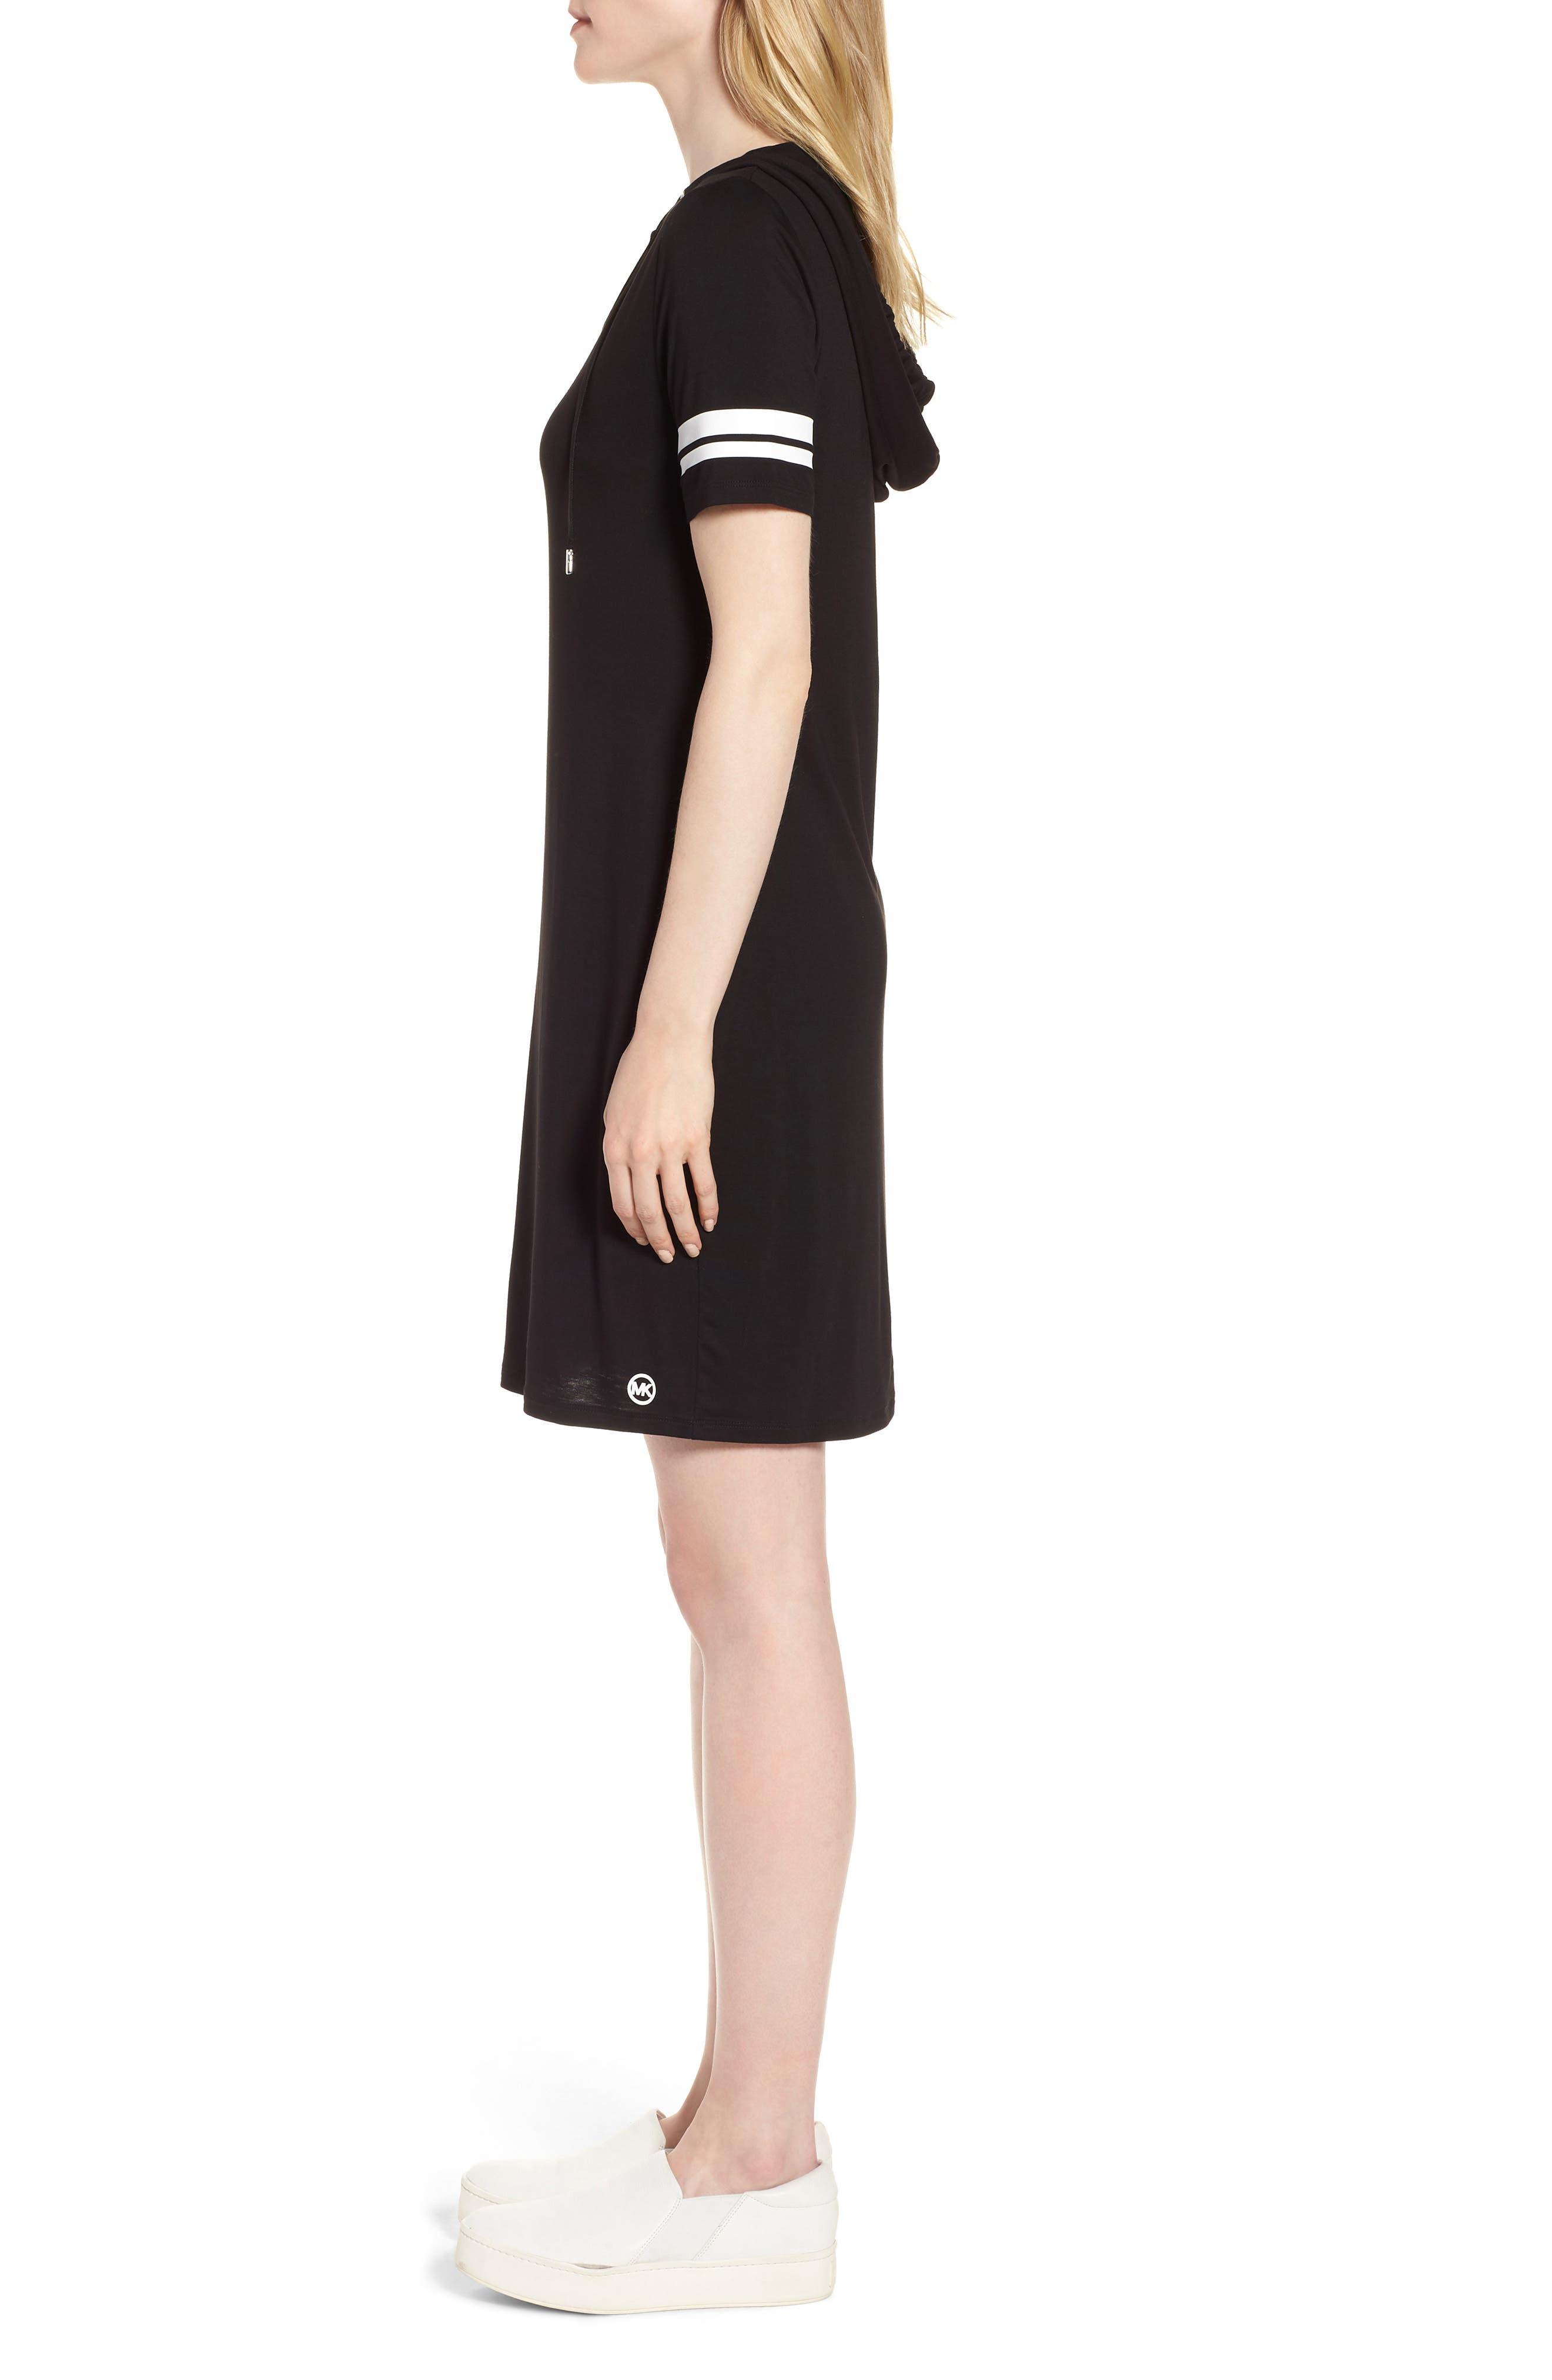 MICHAEL Michal Kors Stripe Sleeve Hoodie Dress,                             Alternate thumbnail 3, color,                             001